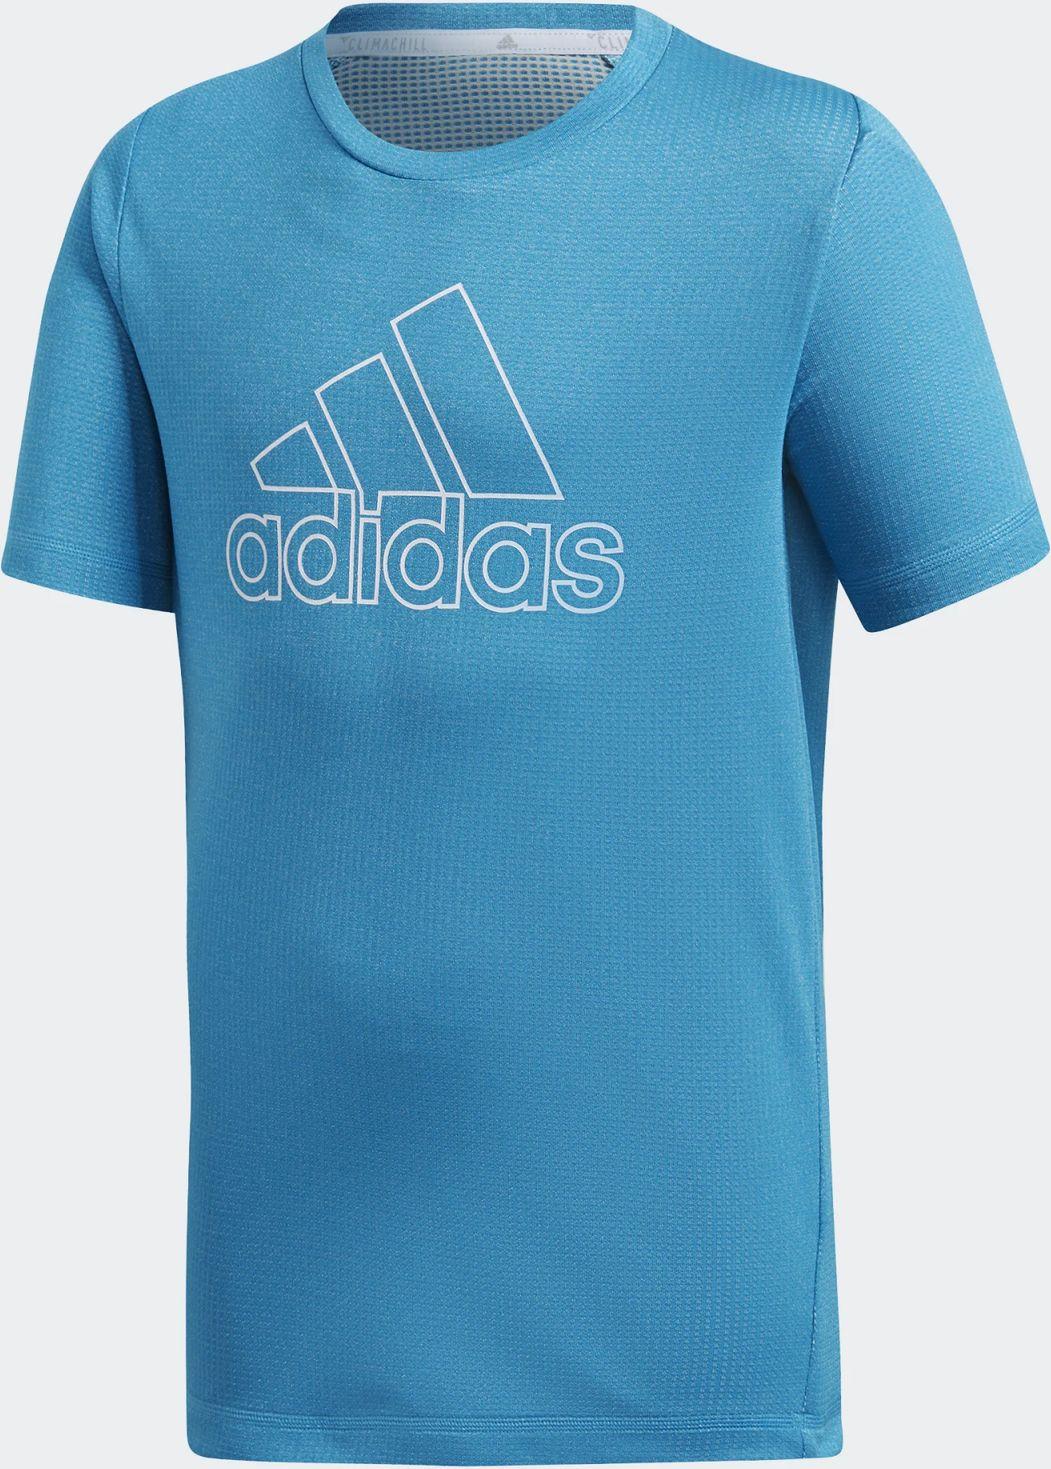 Футболка adidas Yb Tr Chill Tee цена